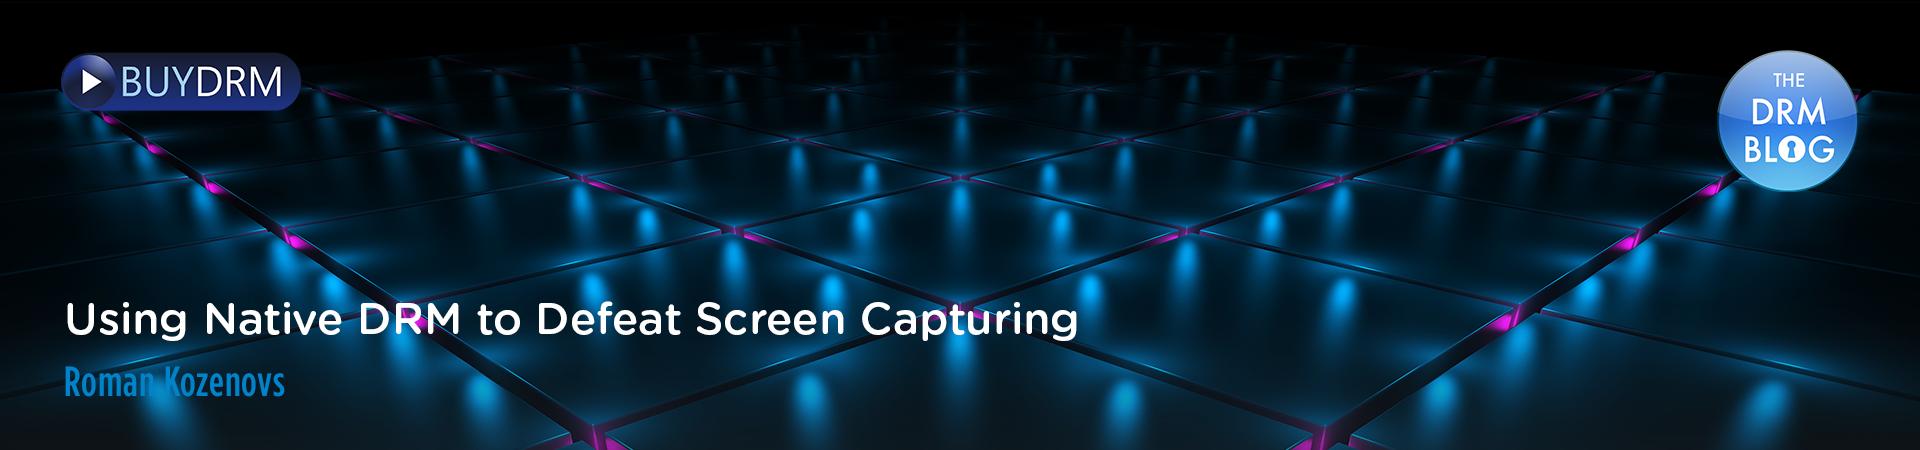 BuyDRM_UsingNativeDRMtoDefeatScreenCapturing_1920x450